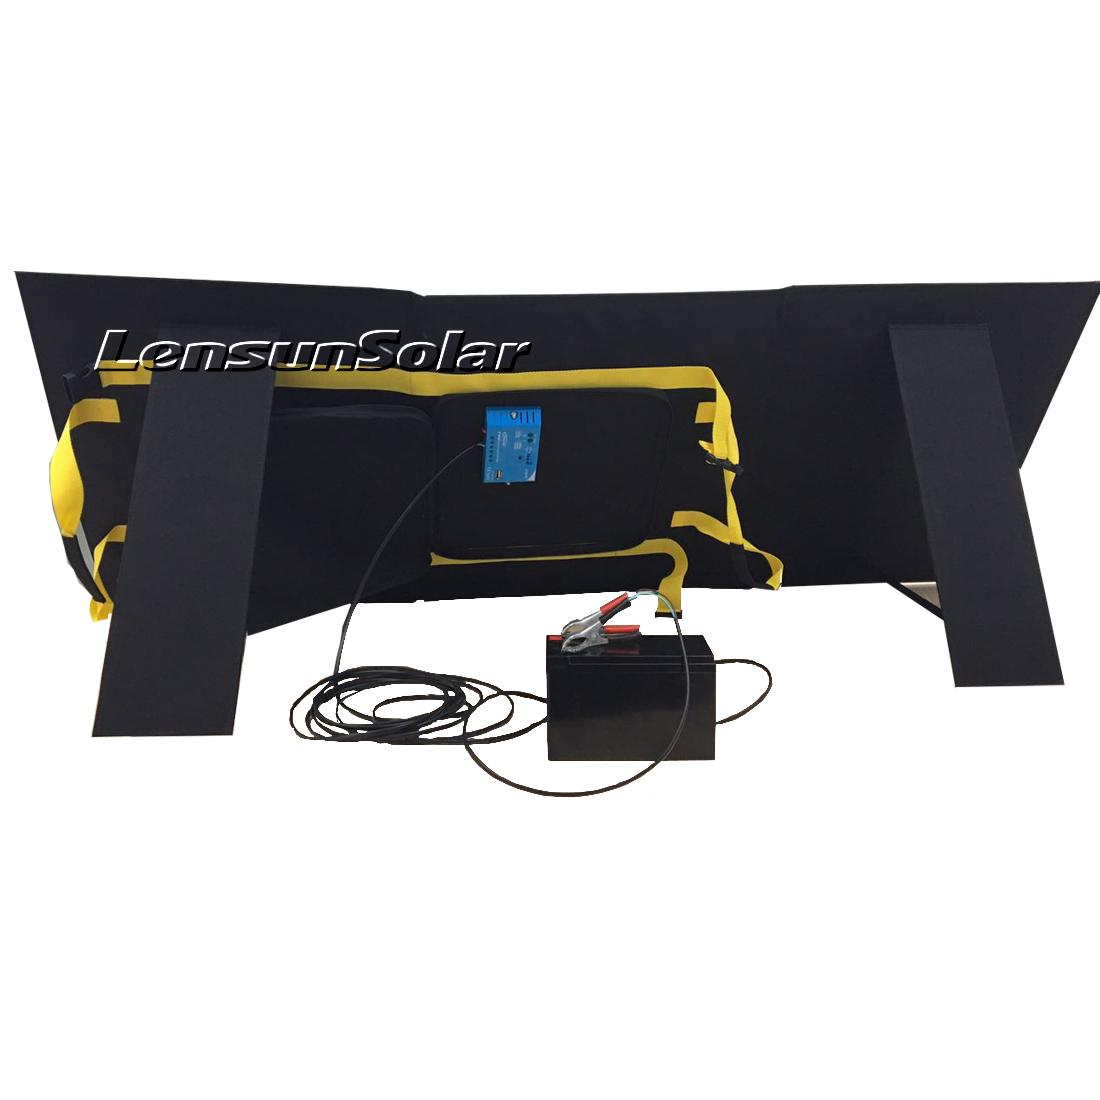 Lensun 100w Solar Charge Power Kit Foldable Portable Flexible Solar Panel For Camping Van